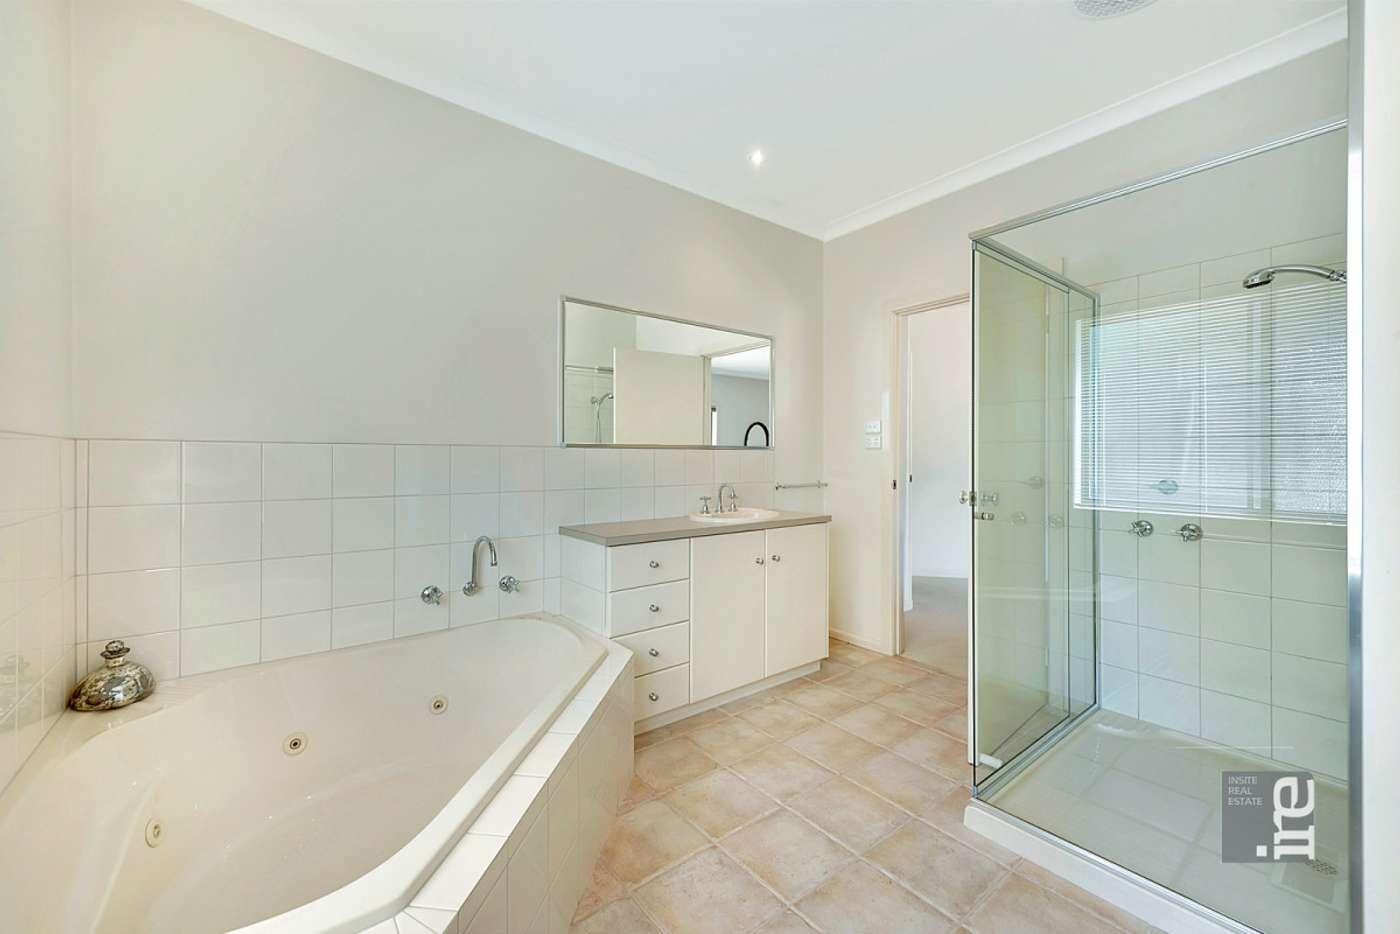 Seventh view of Homely house listing, 5 Waldara Drive, Wangaratta VIC 3677